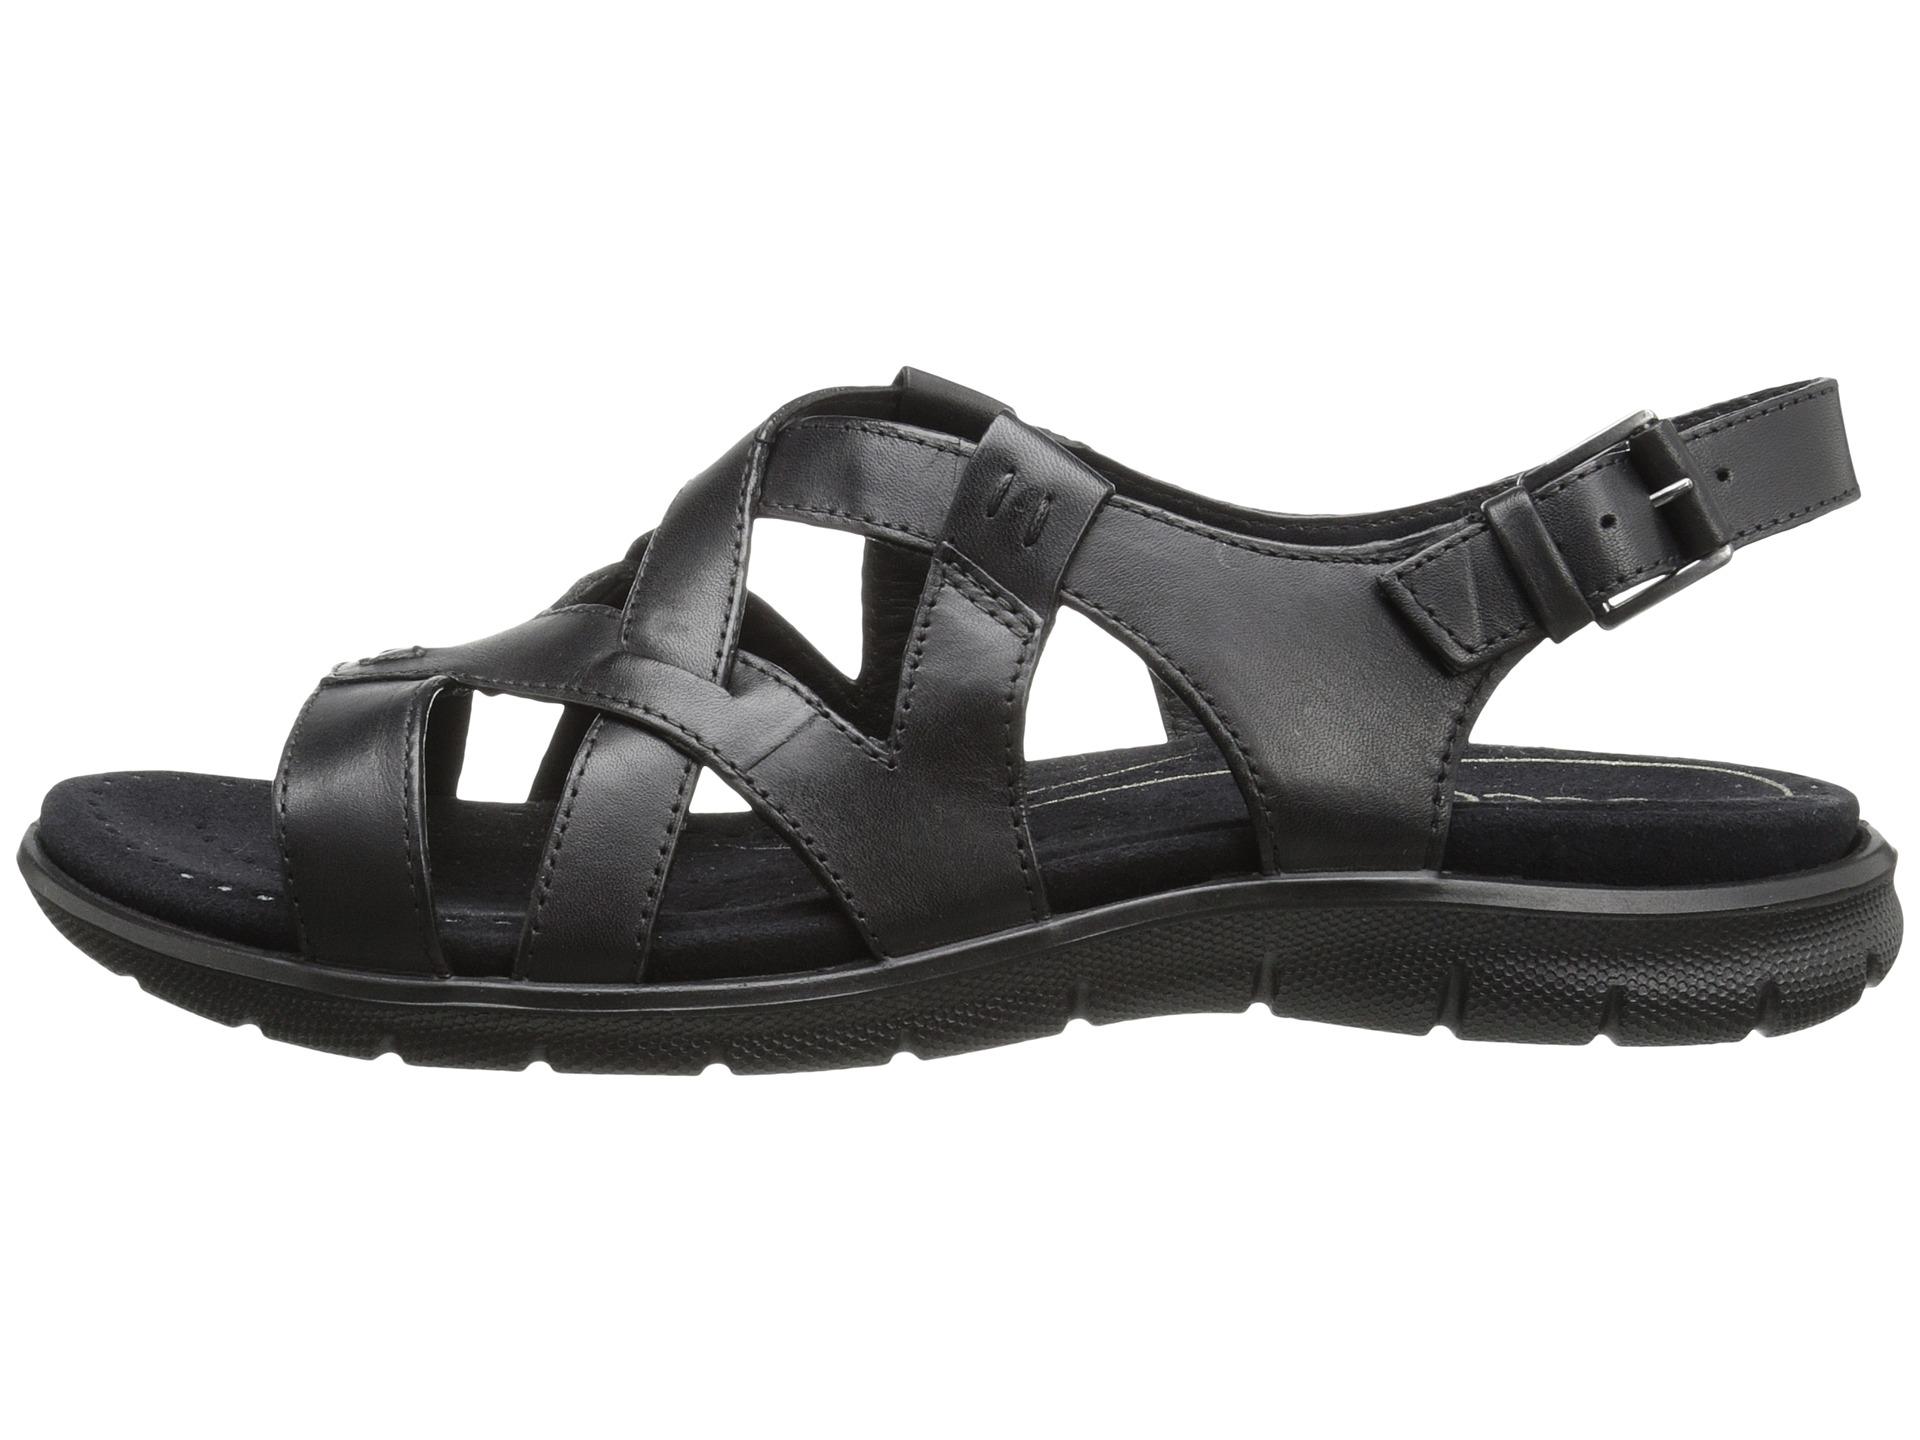 e78f9afaf173 Lyst - Ecco Babett Sandal Cross Strap in Black